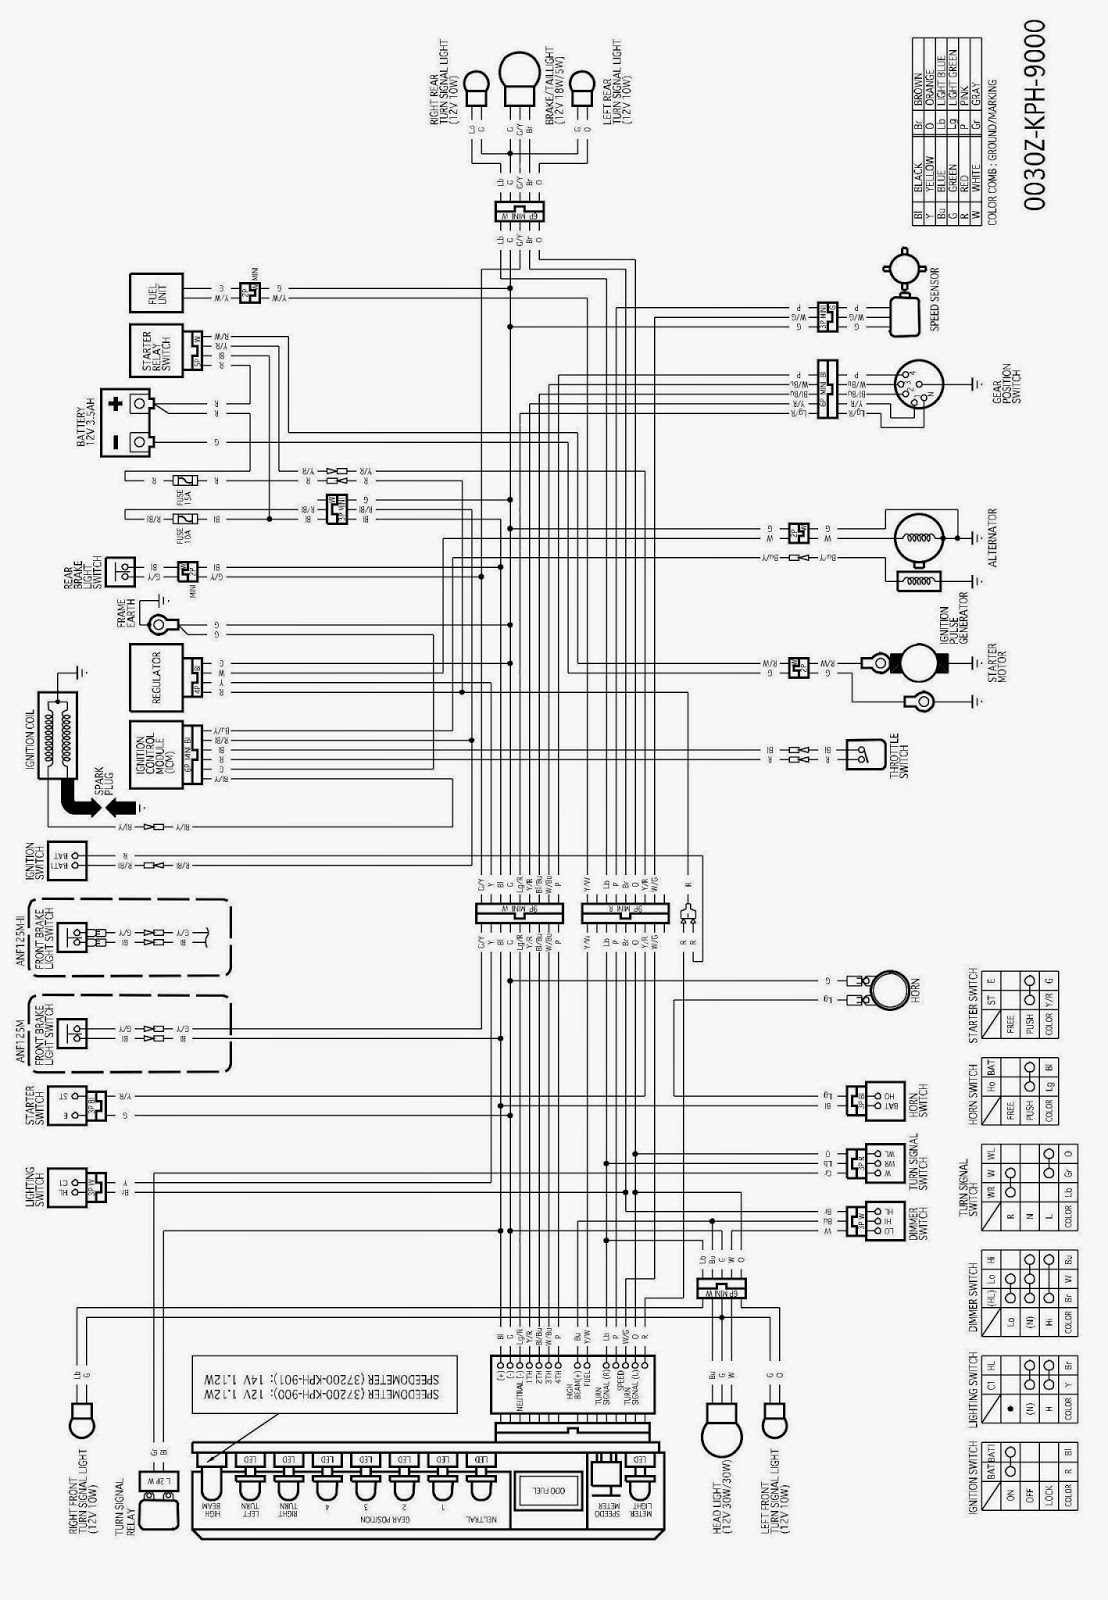 skema kelistrikan motor: honda kharisma